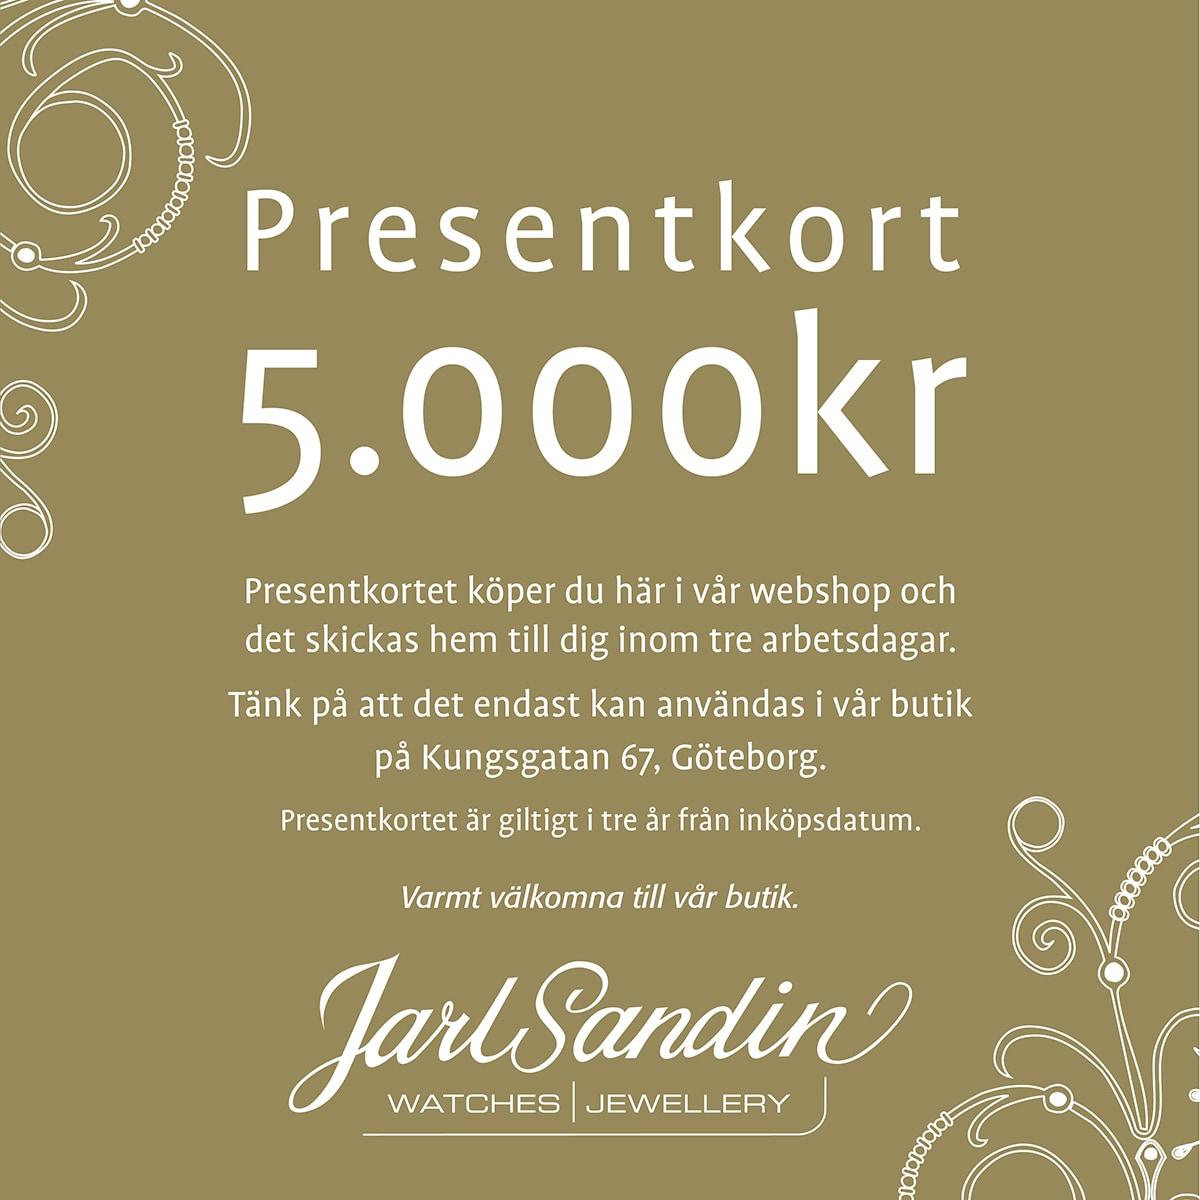 Presentkort_Jarl_Sandin_ 5000kr